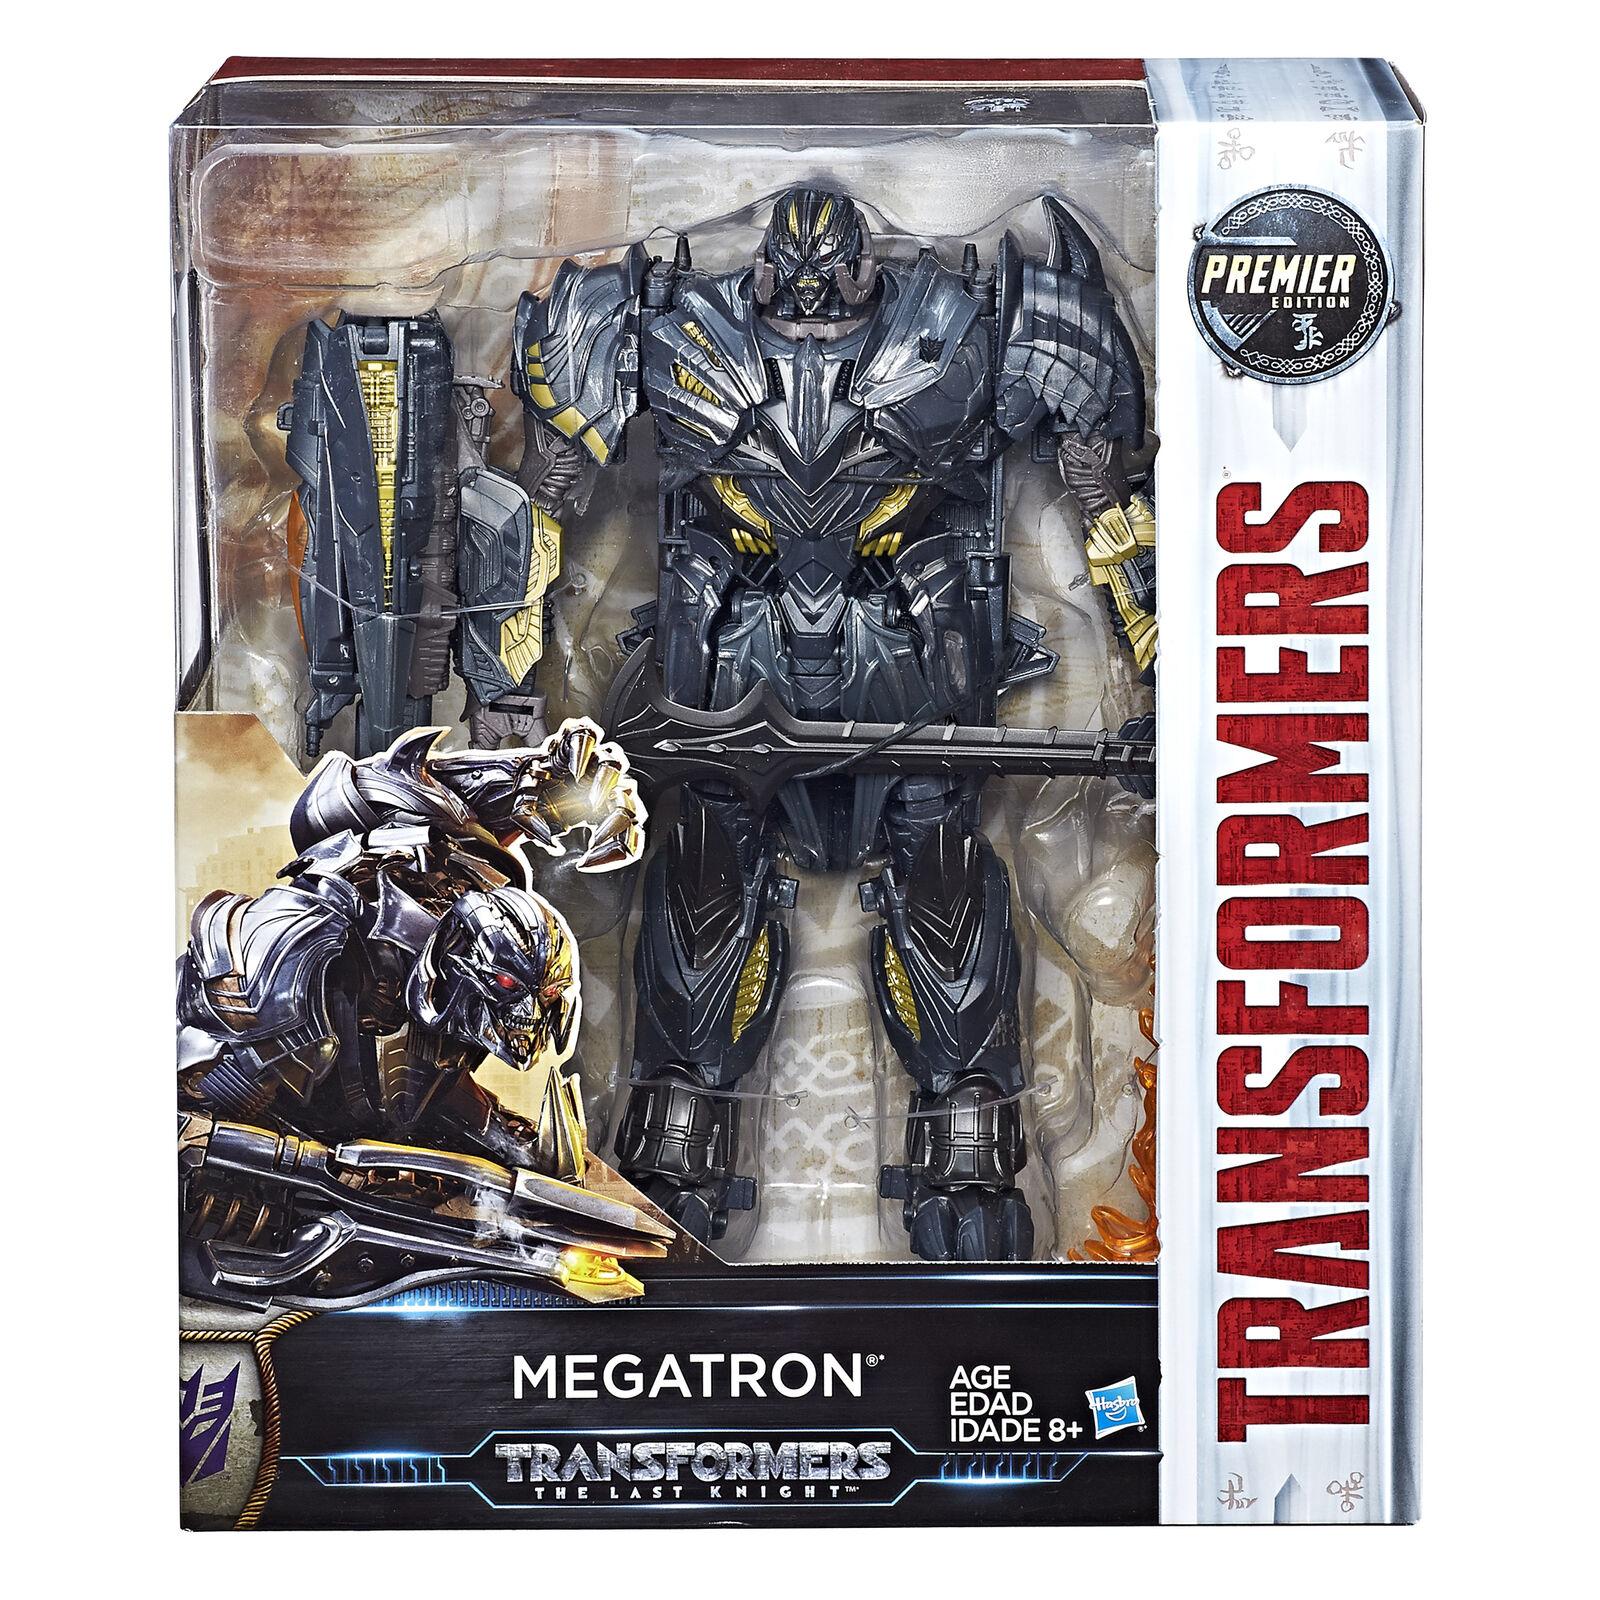 Hasbro Transformers Last Knight Premier Edition Leader Class Megatron New